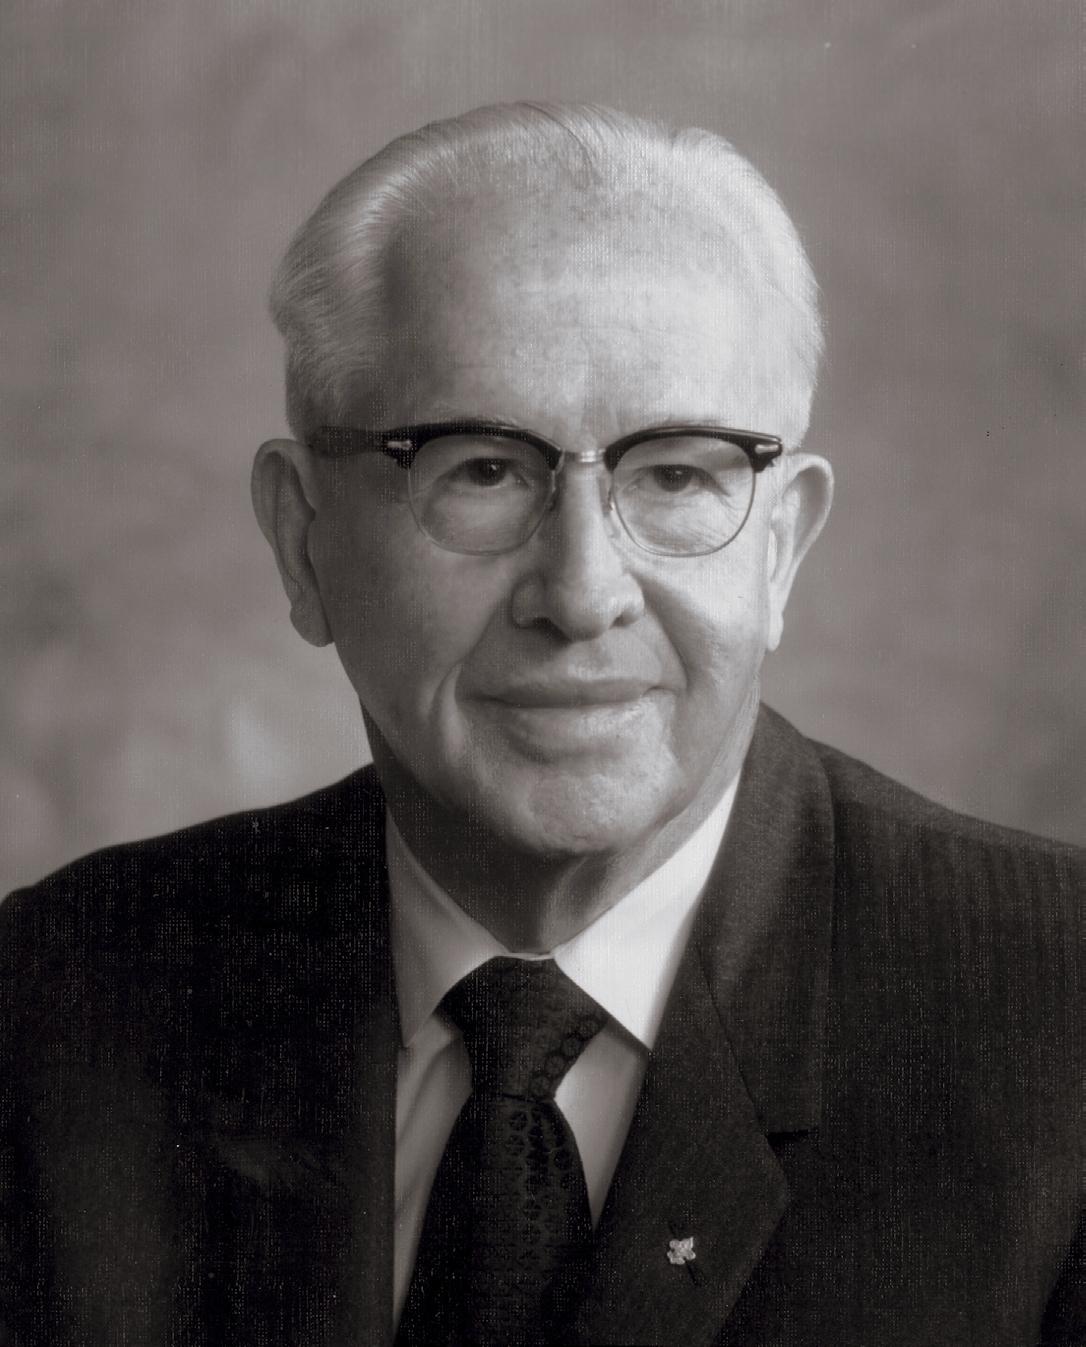 President Ezra Taft Benson around 1962. Teachings of Presidents of the Church: Ezra Taft Benson (2014), iv